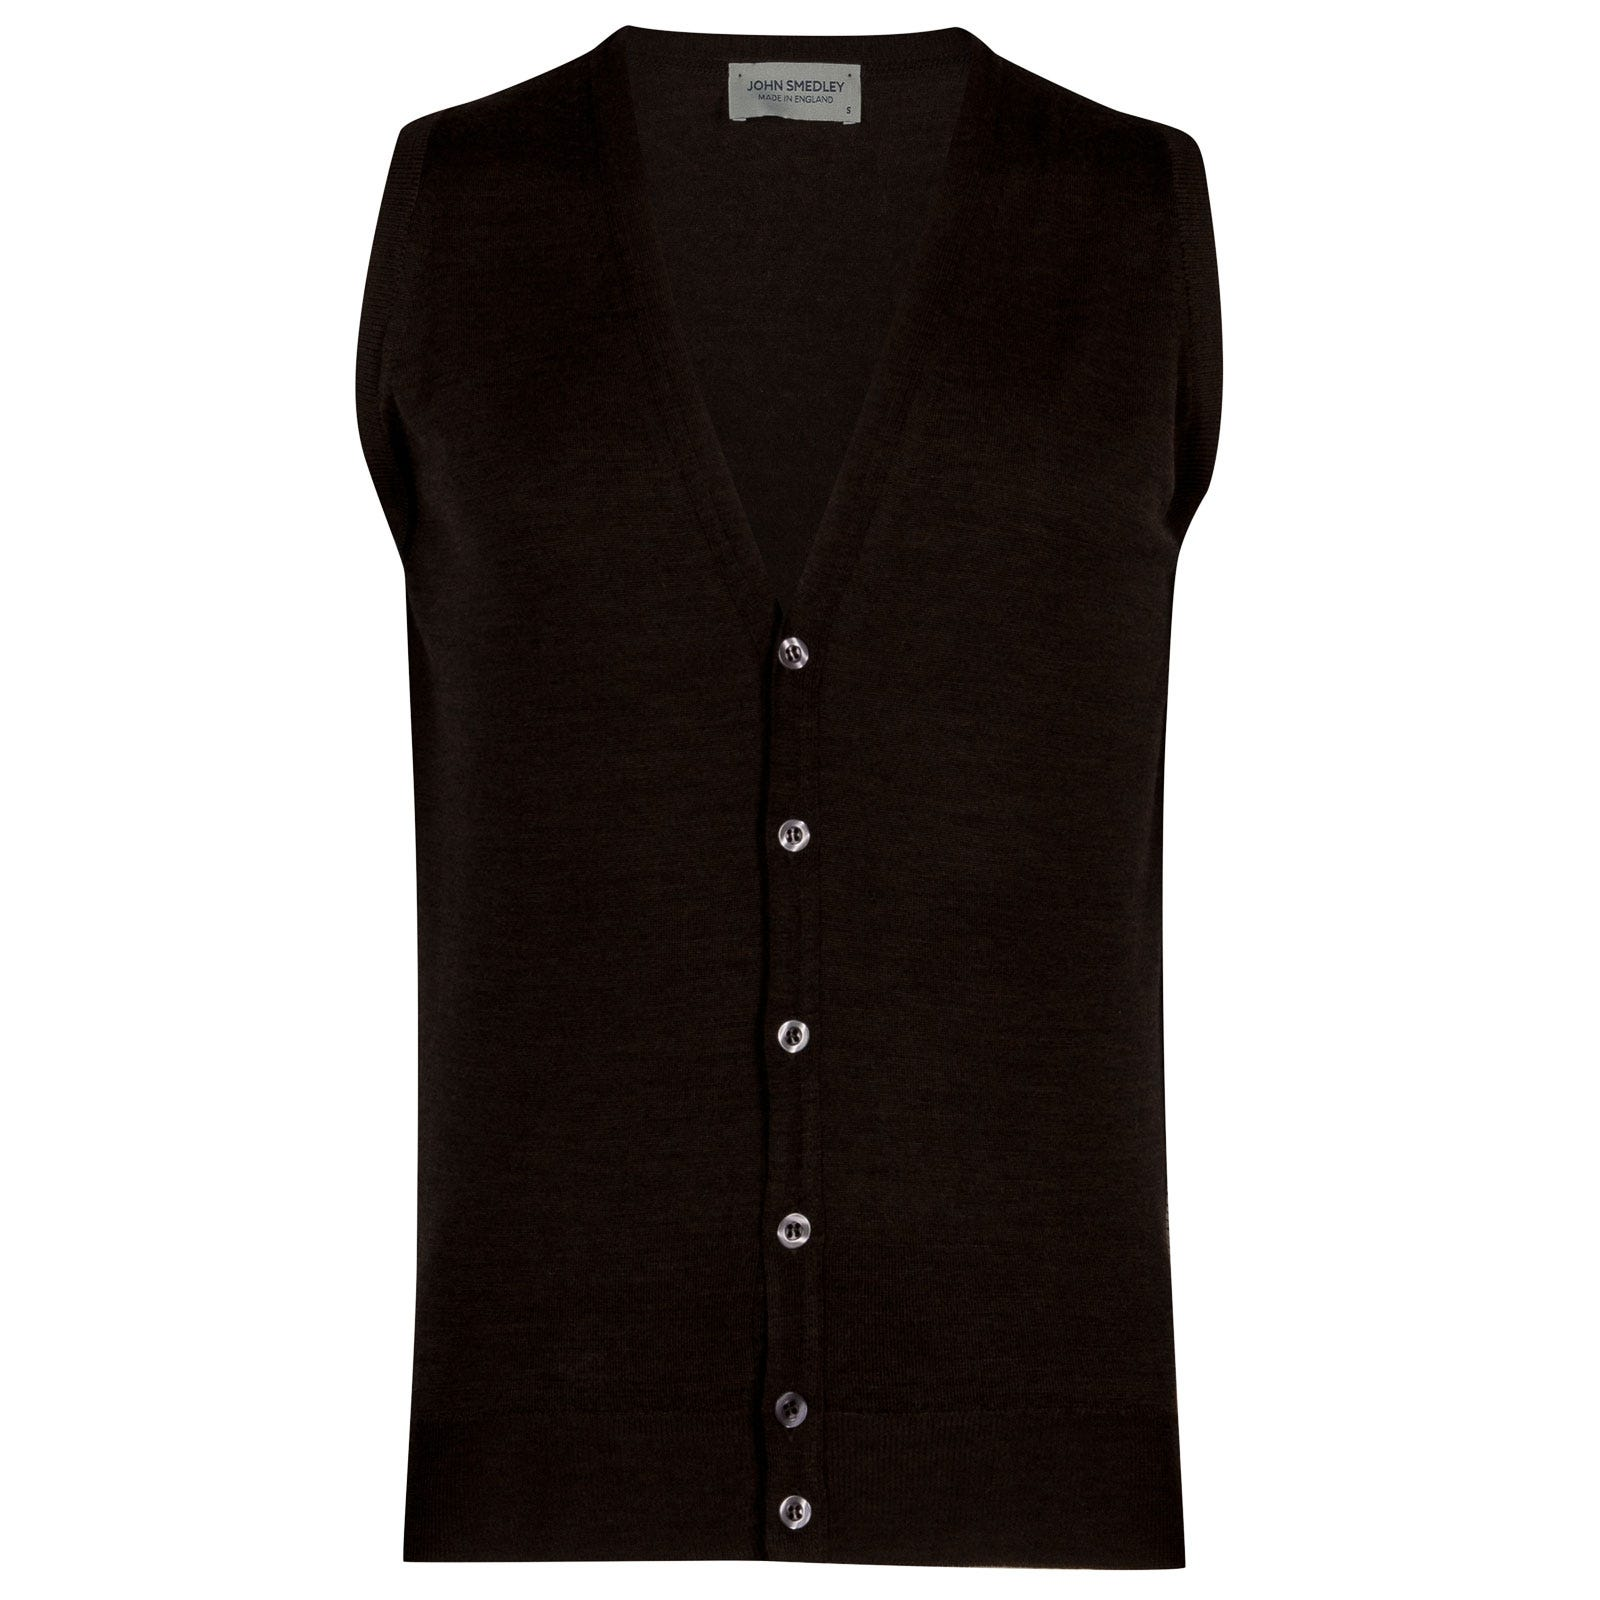 John Smedley HuntswoodMerino Wool Waistcoat in Chestnut-L